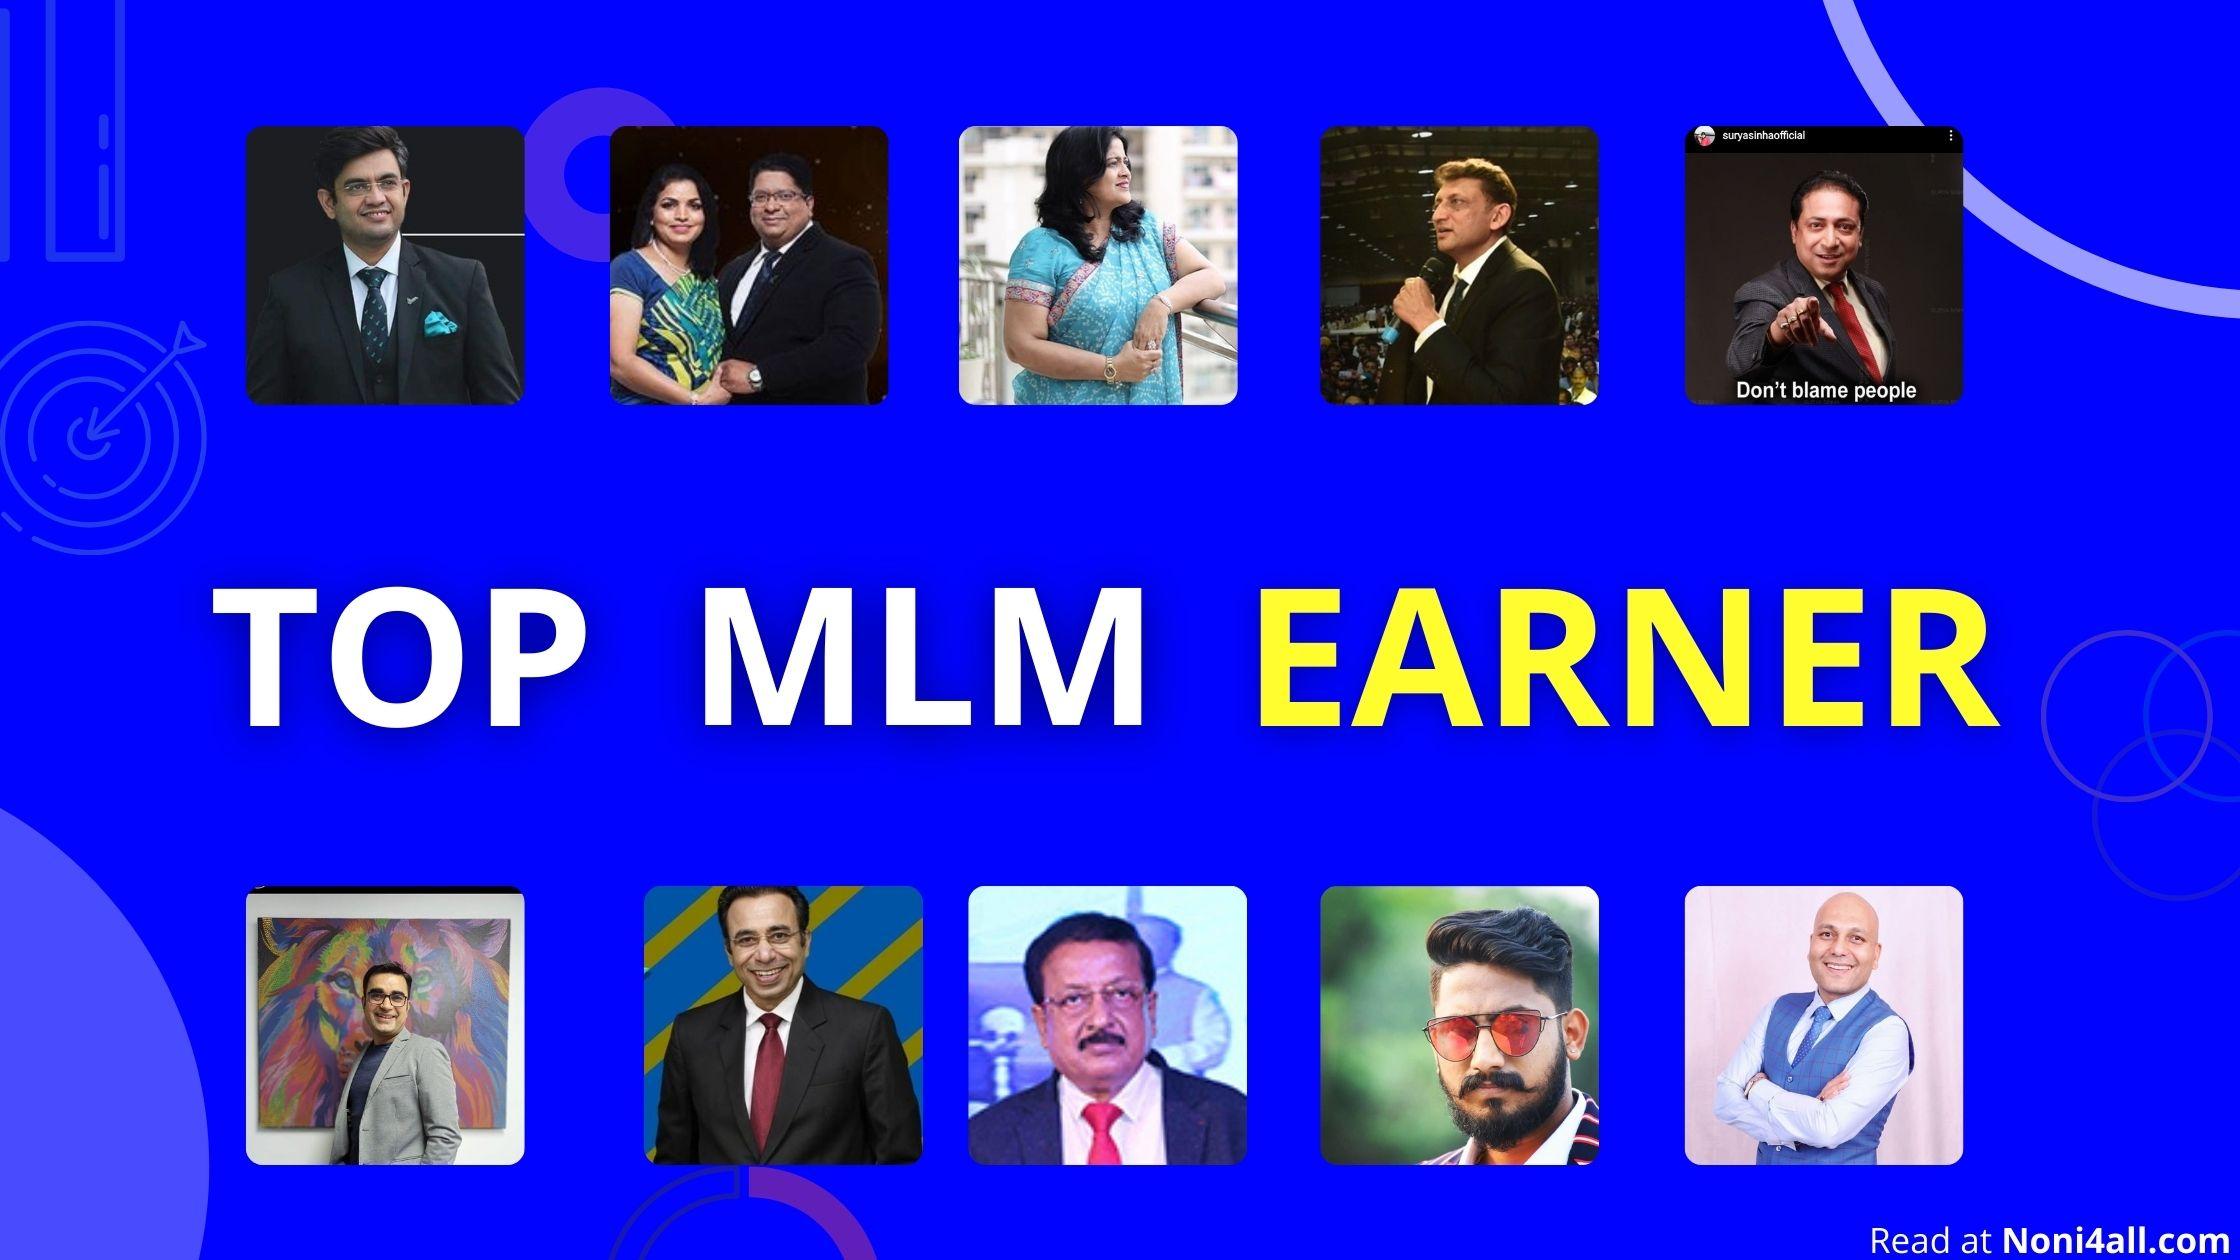 Top MLM Earner